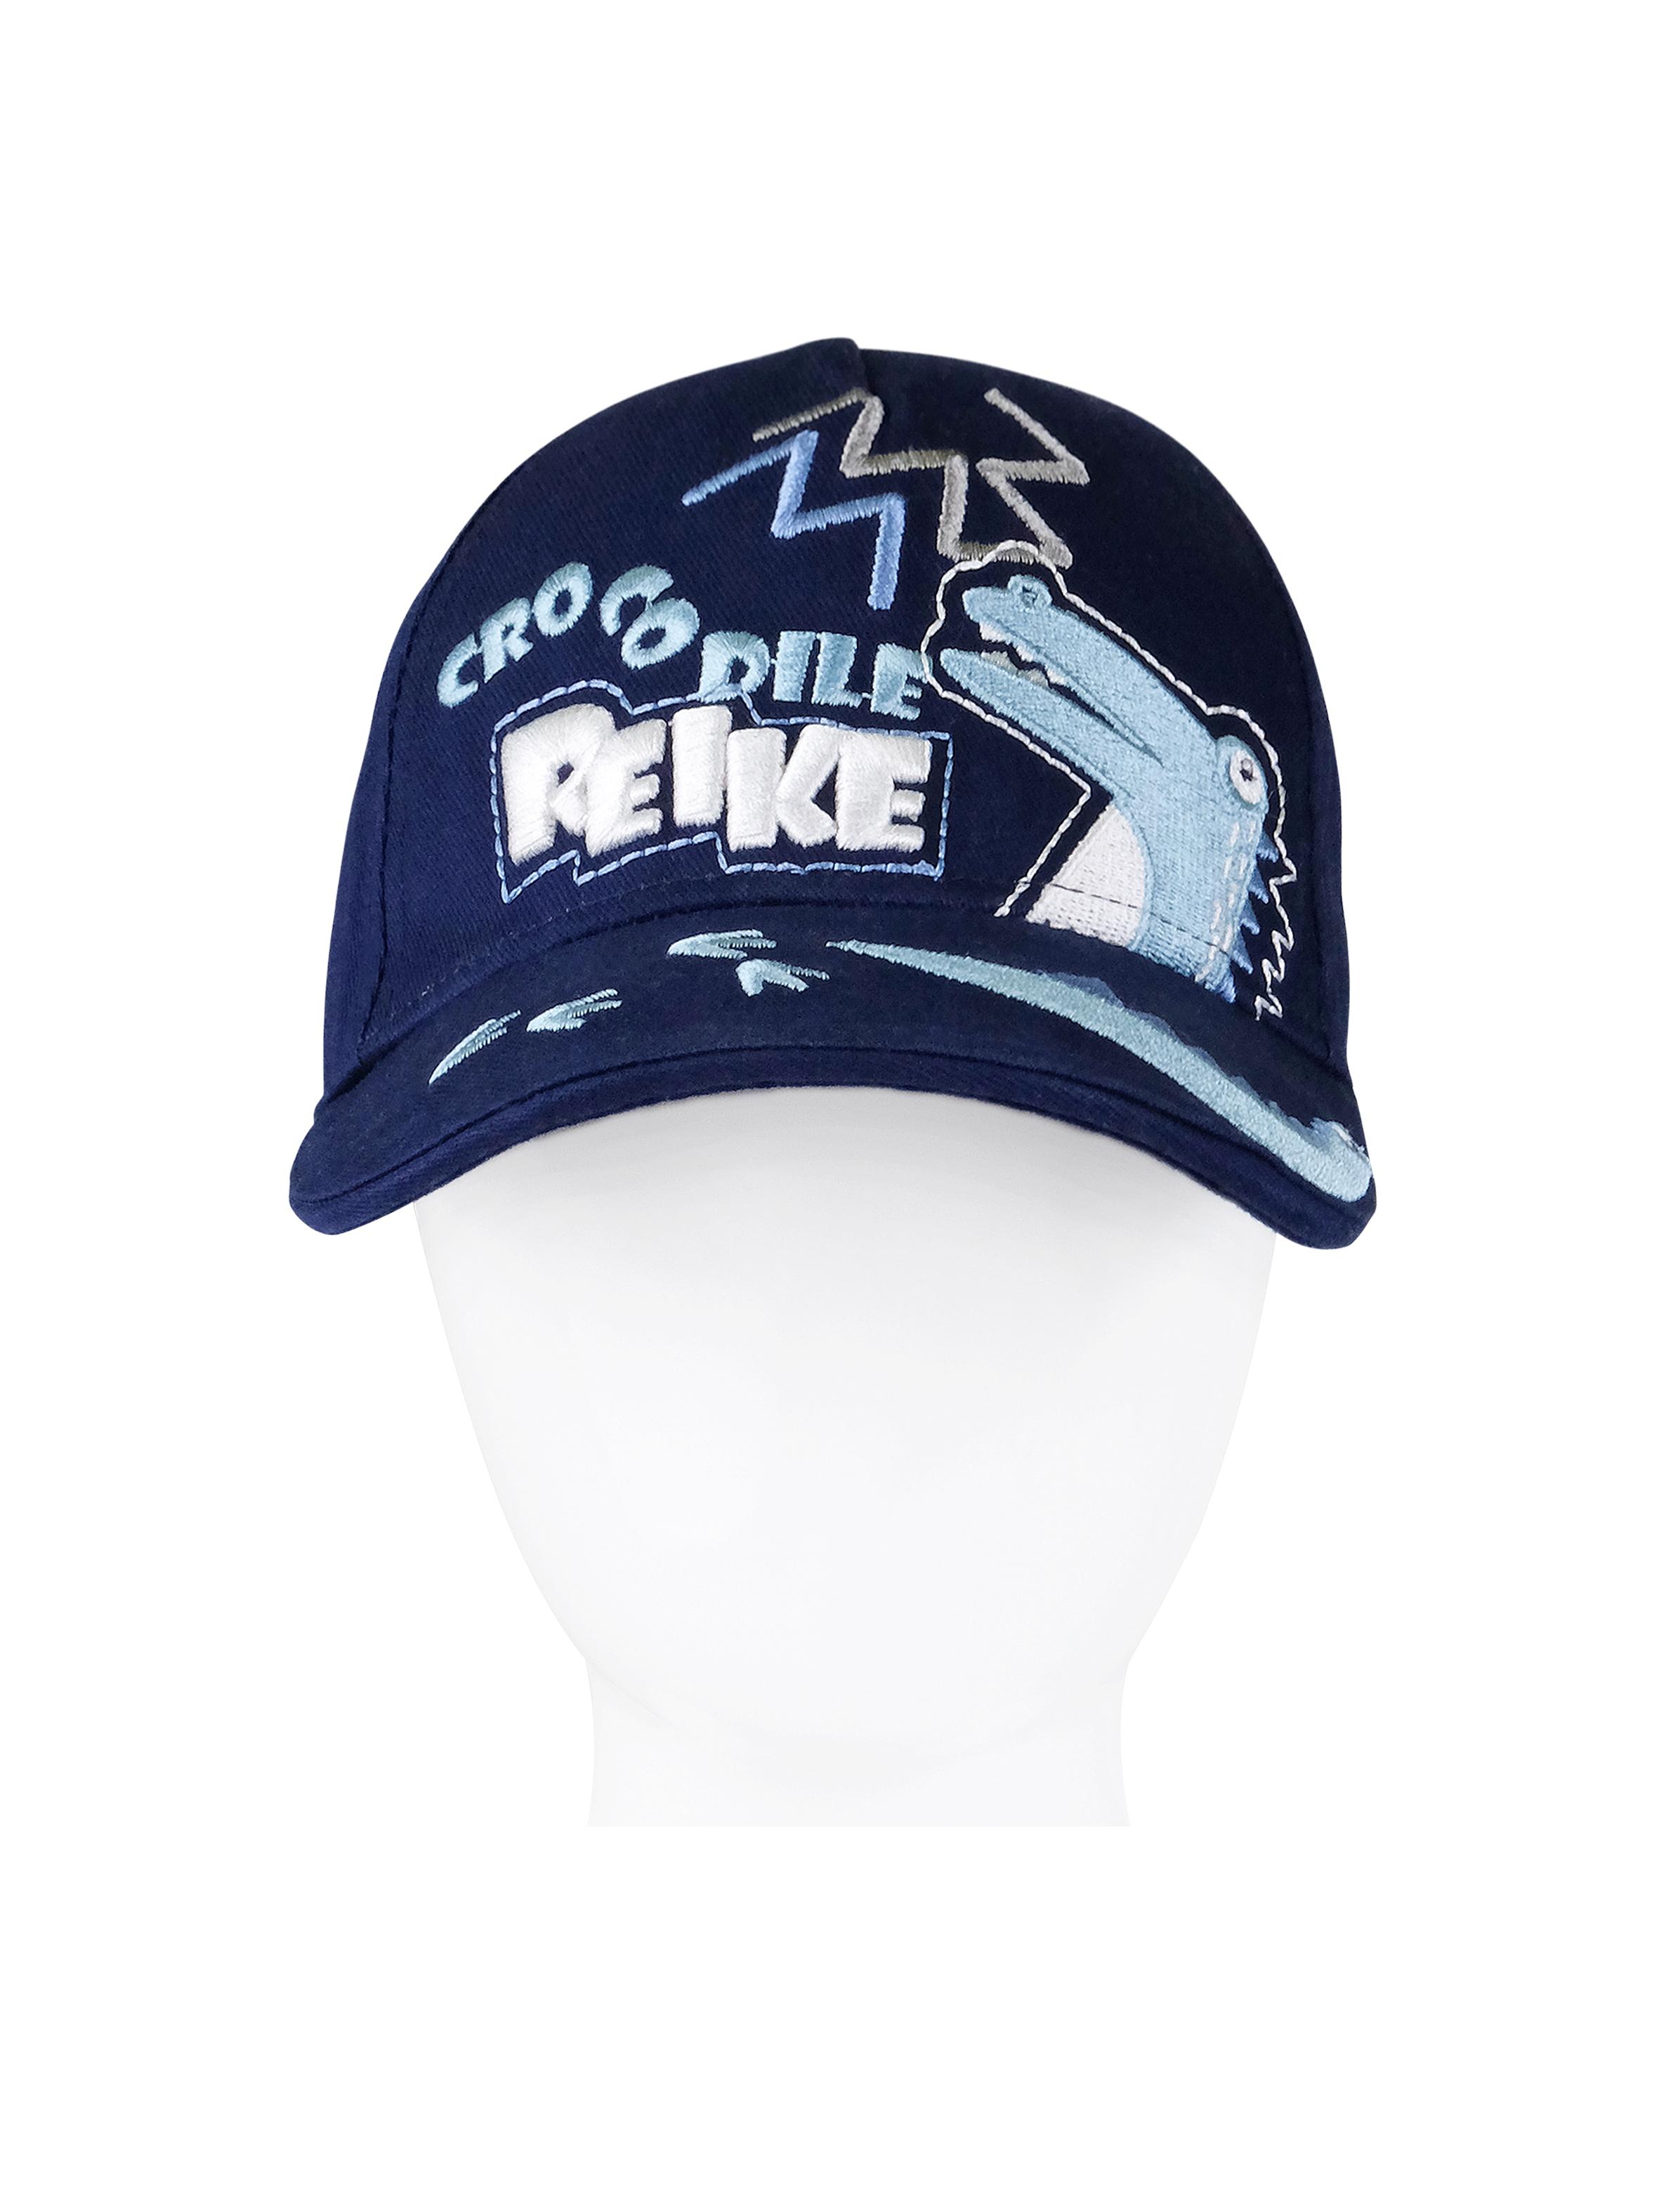 Кепка для мальчика Reike Crocodiles navy, RWSS20